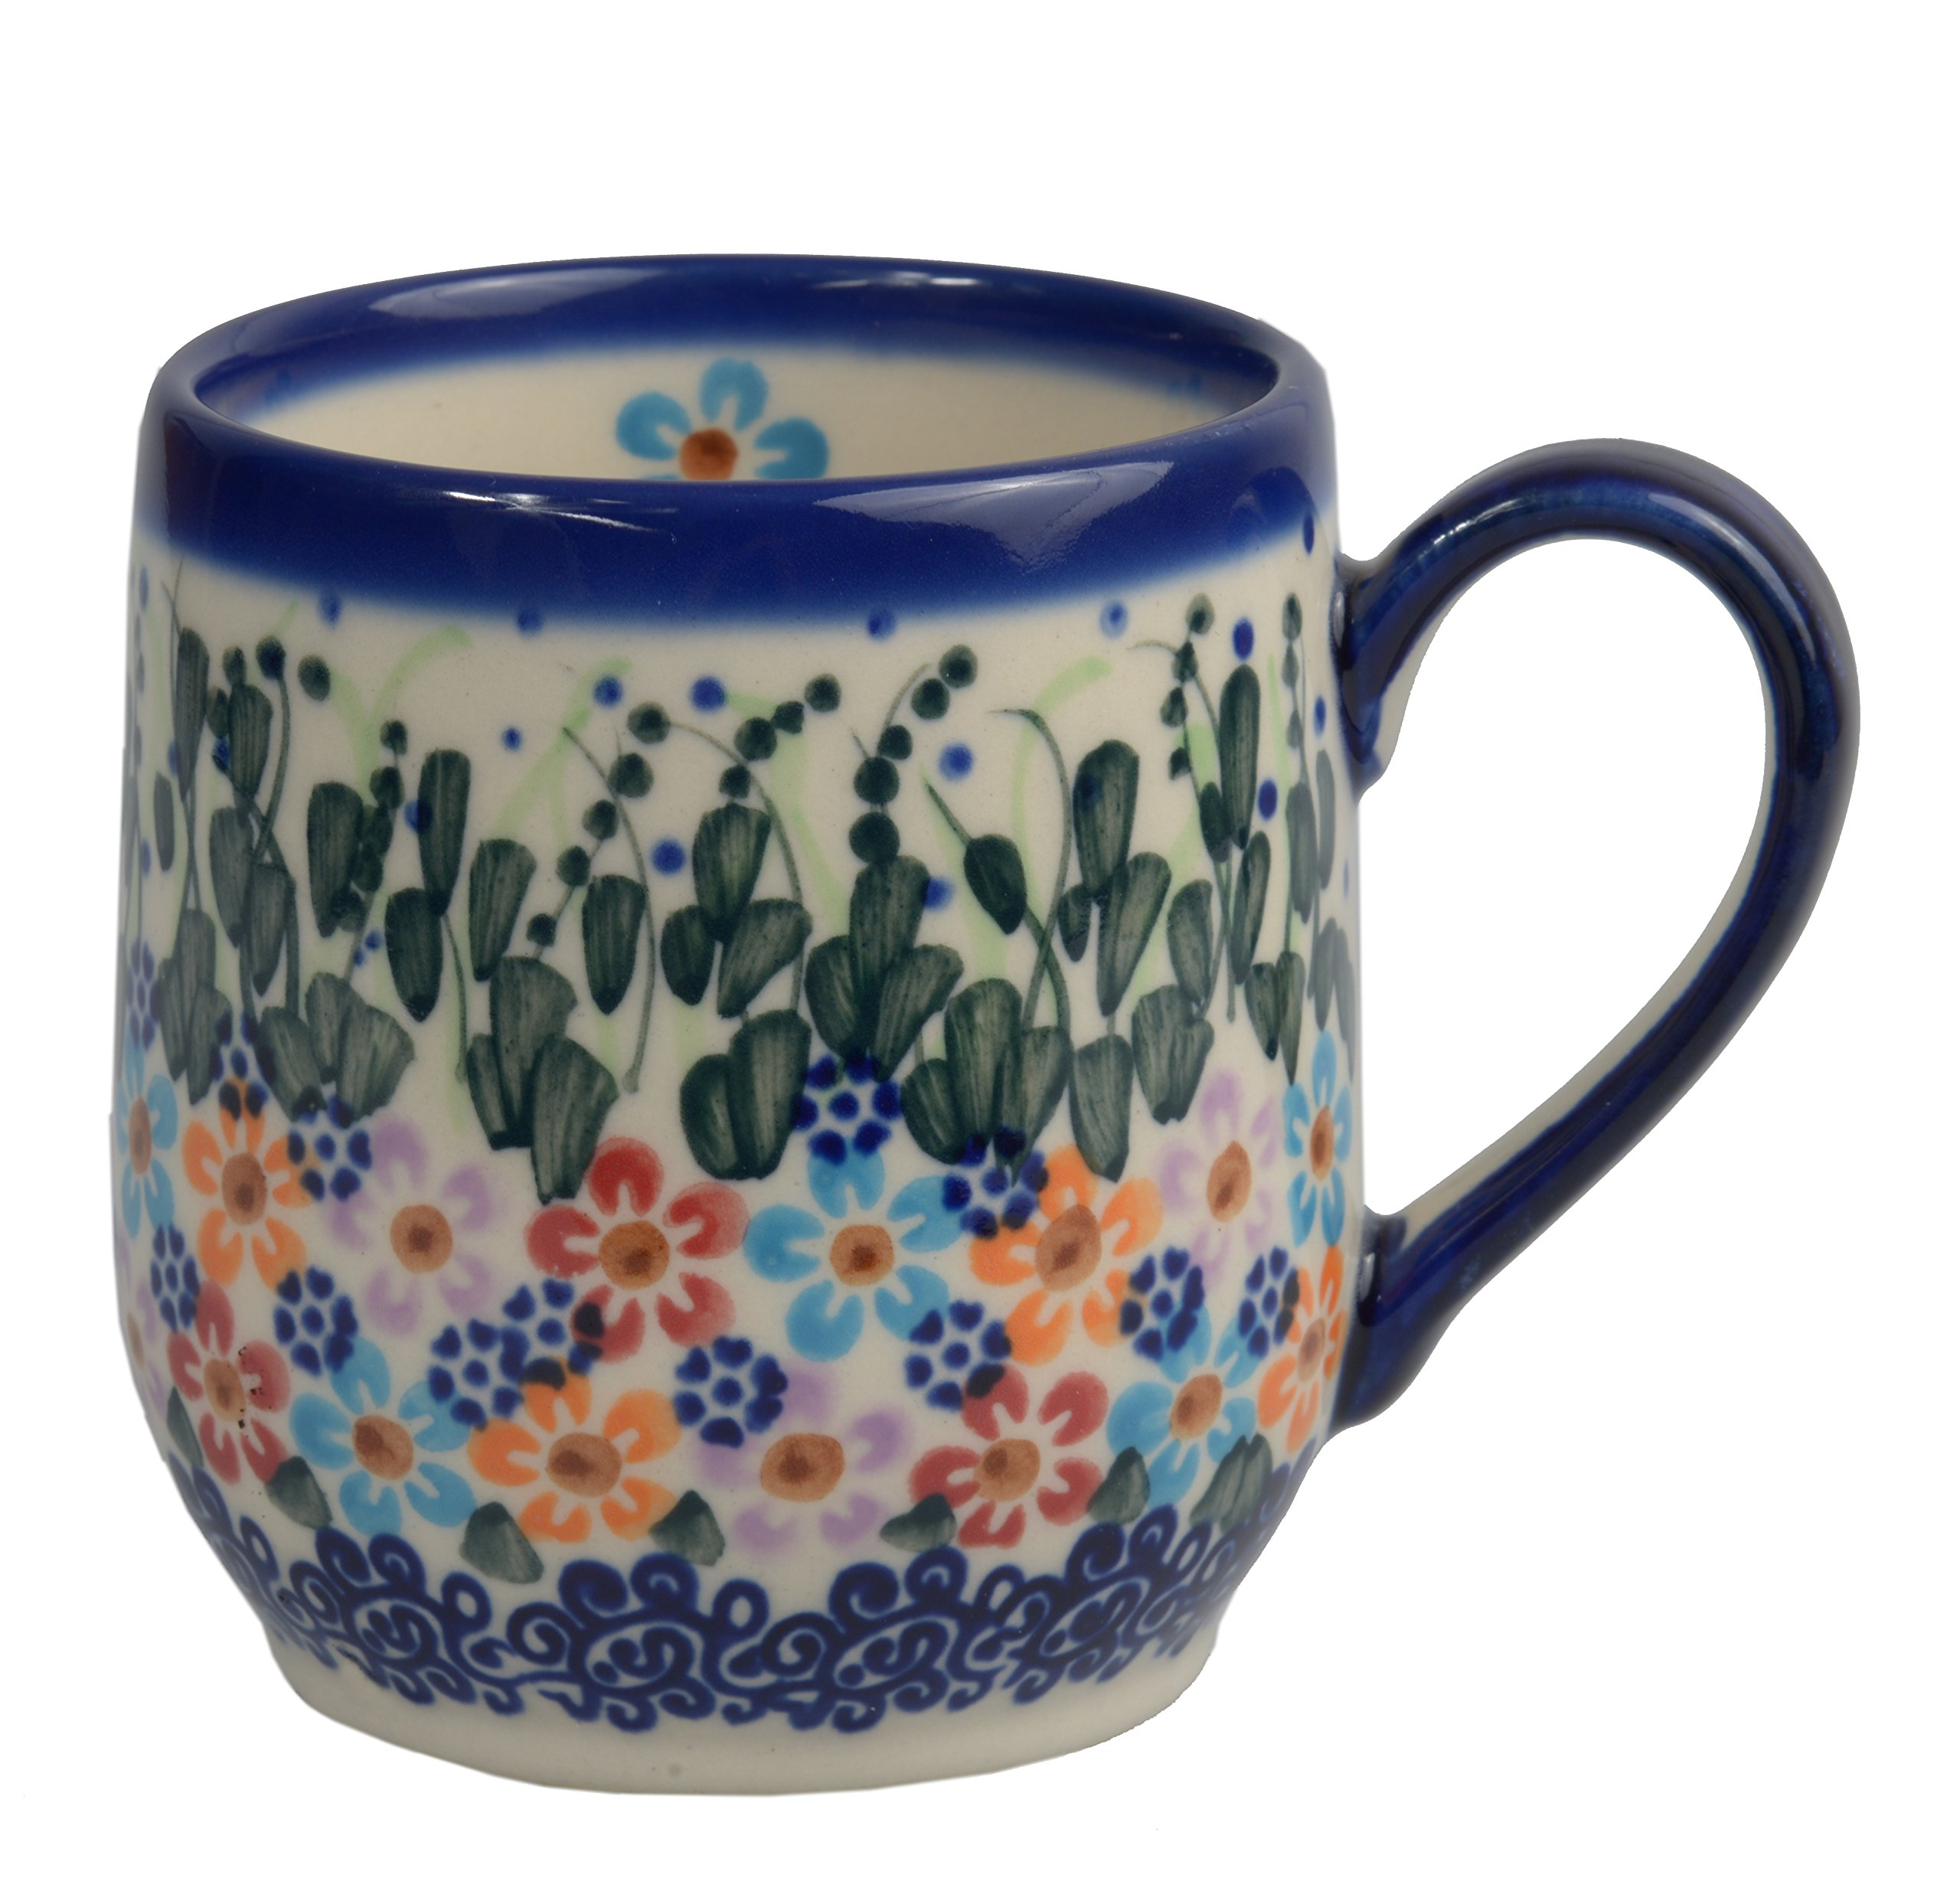 Traditional Polish Pottery, Handcrafted Ceramic Tulip-shaped Mug (300ml / 10.5 fl oz), Boleslawiec Style Pattern, Q.901.DAISY